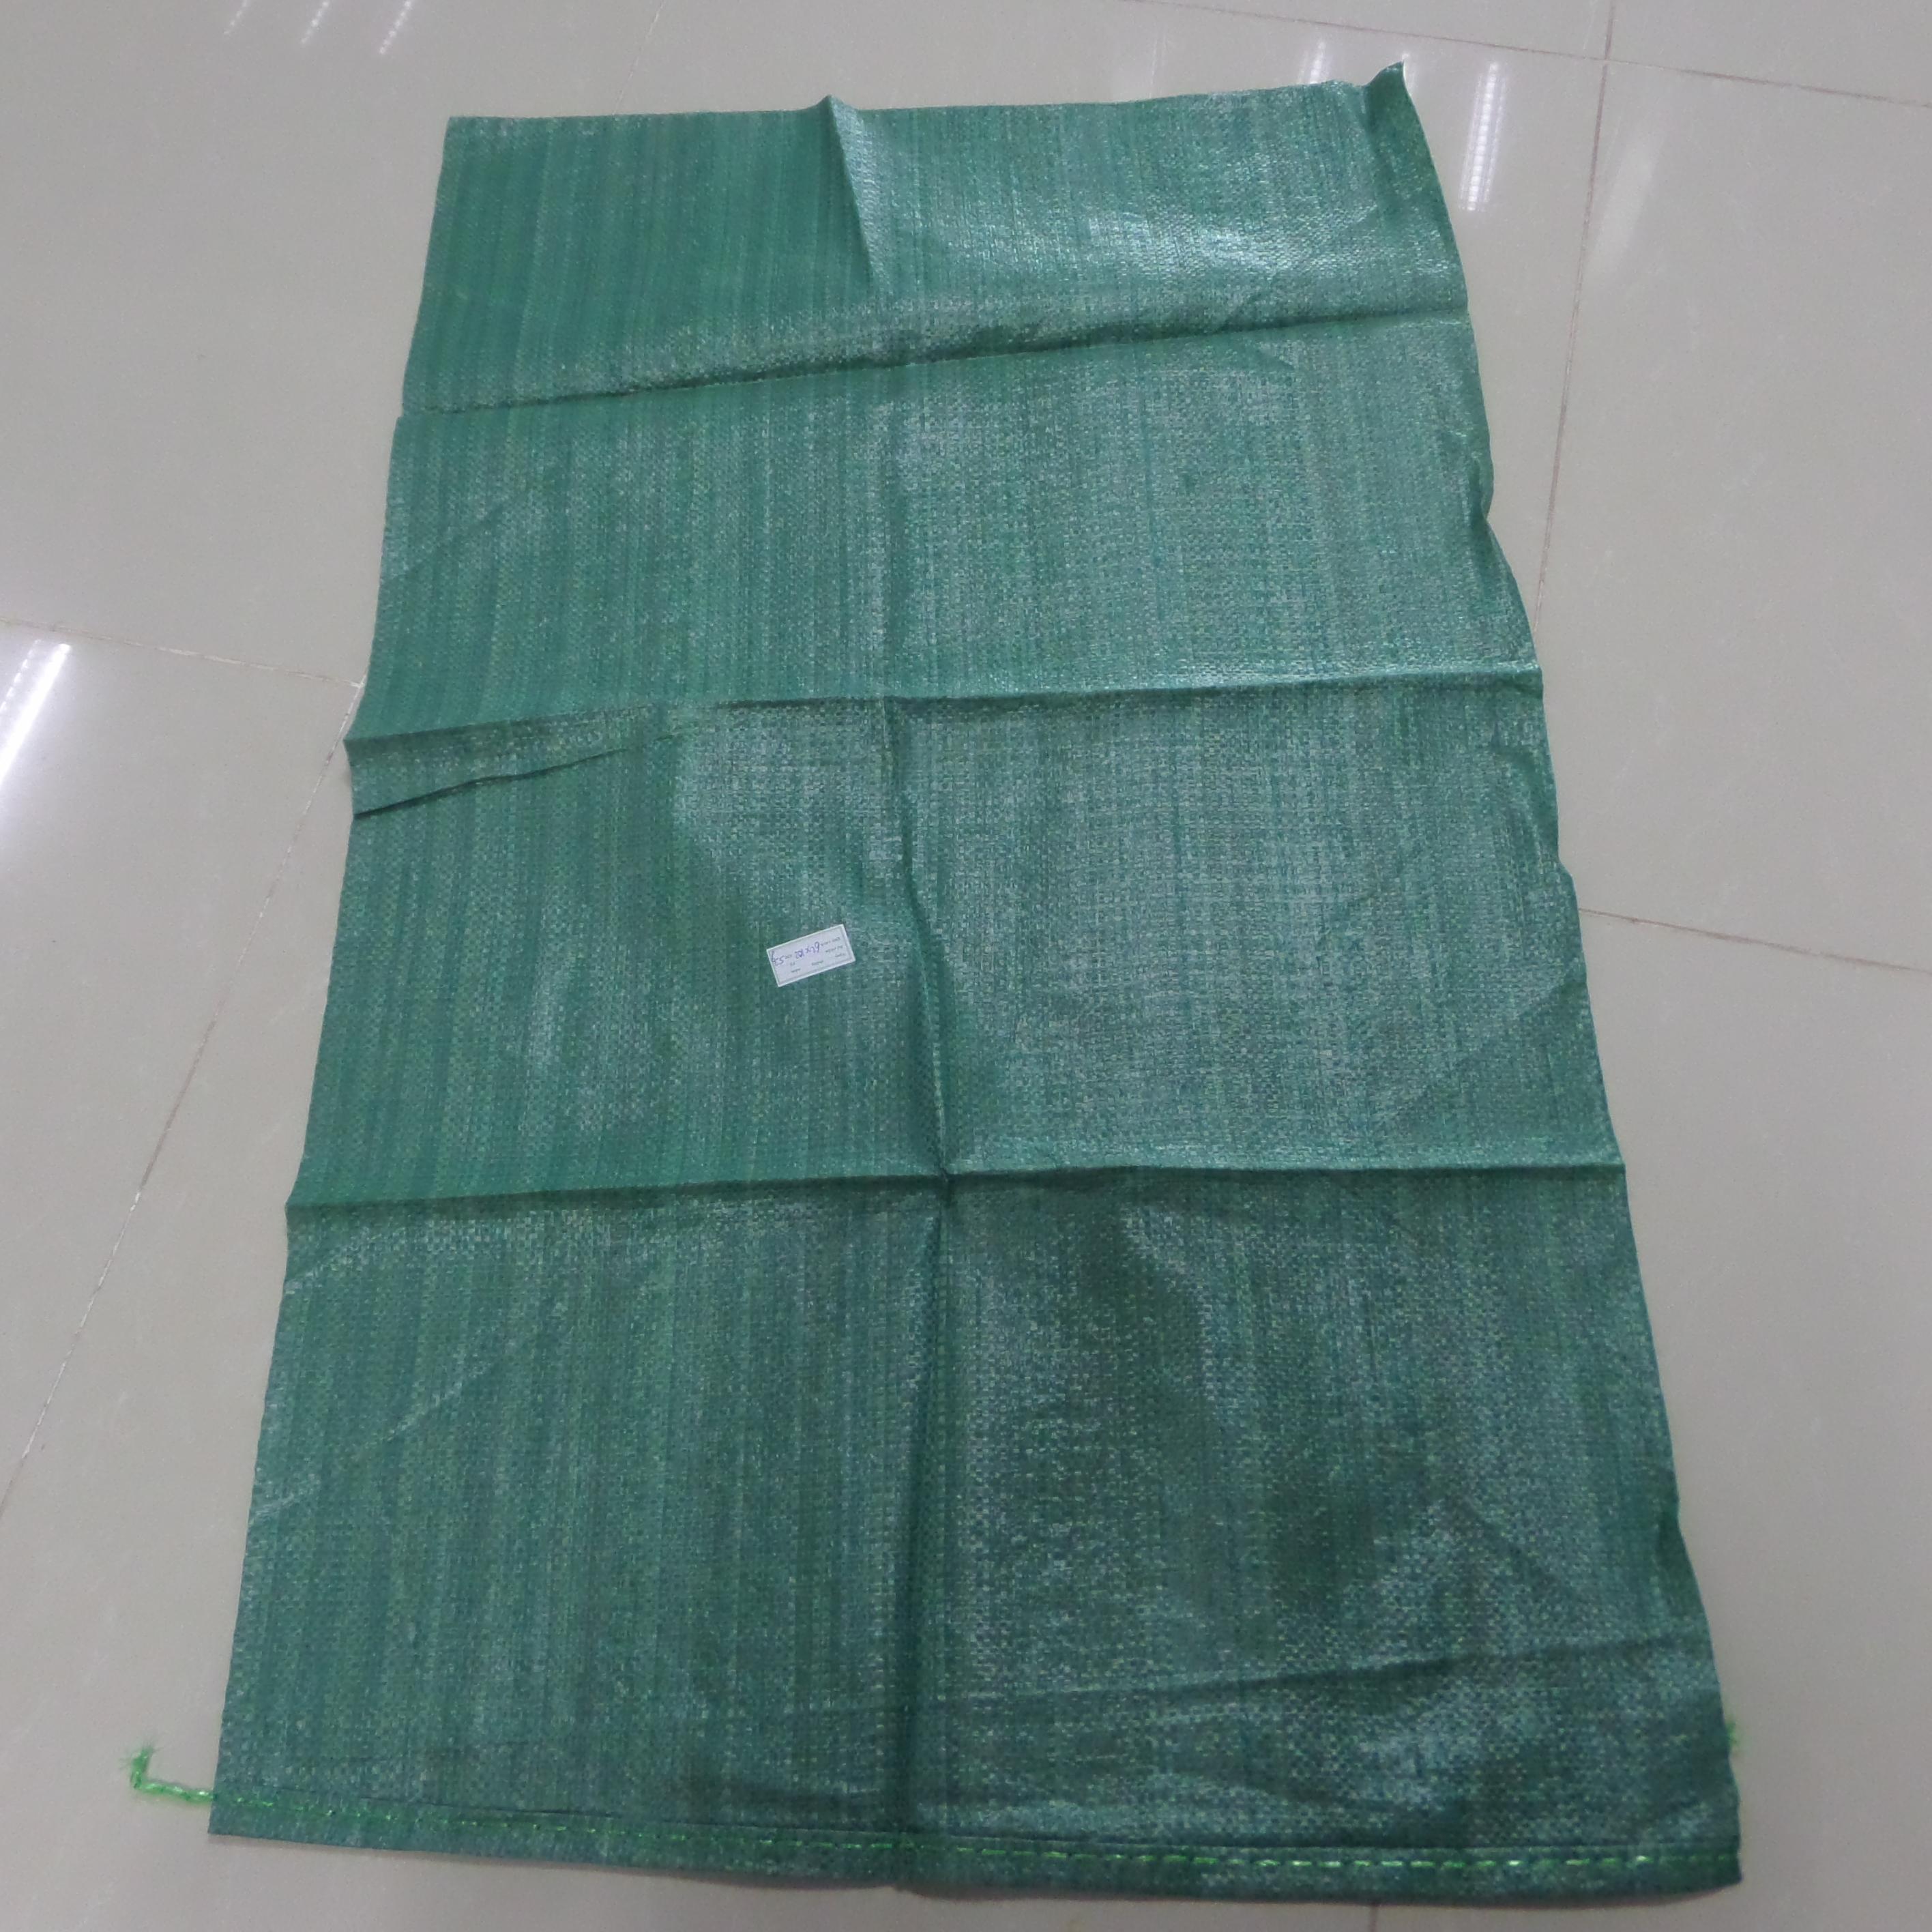 Bao Xanh cốm Kt 62 * 105 / 60 (g/m2)